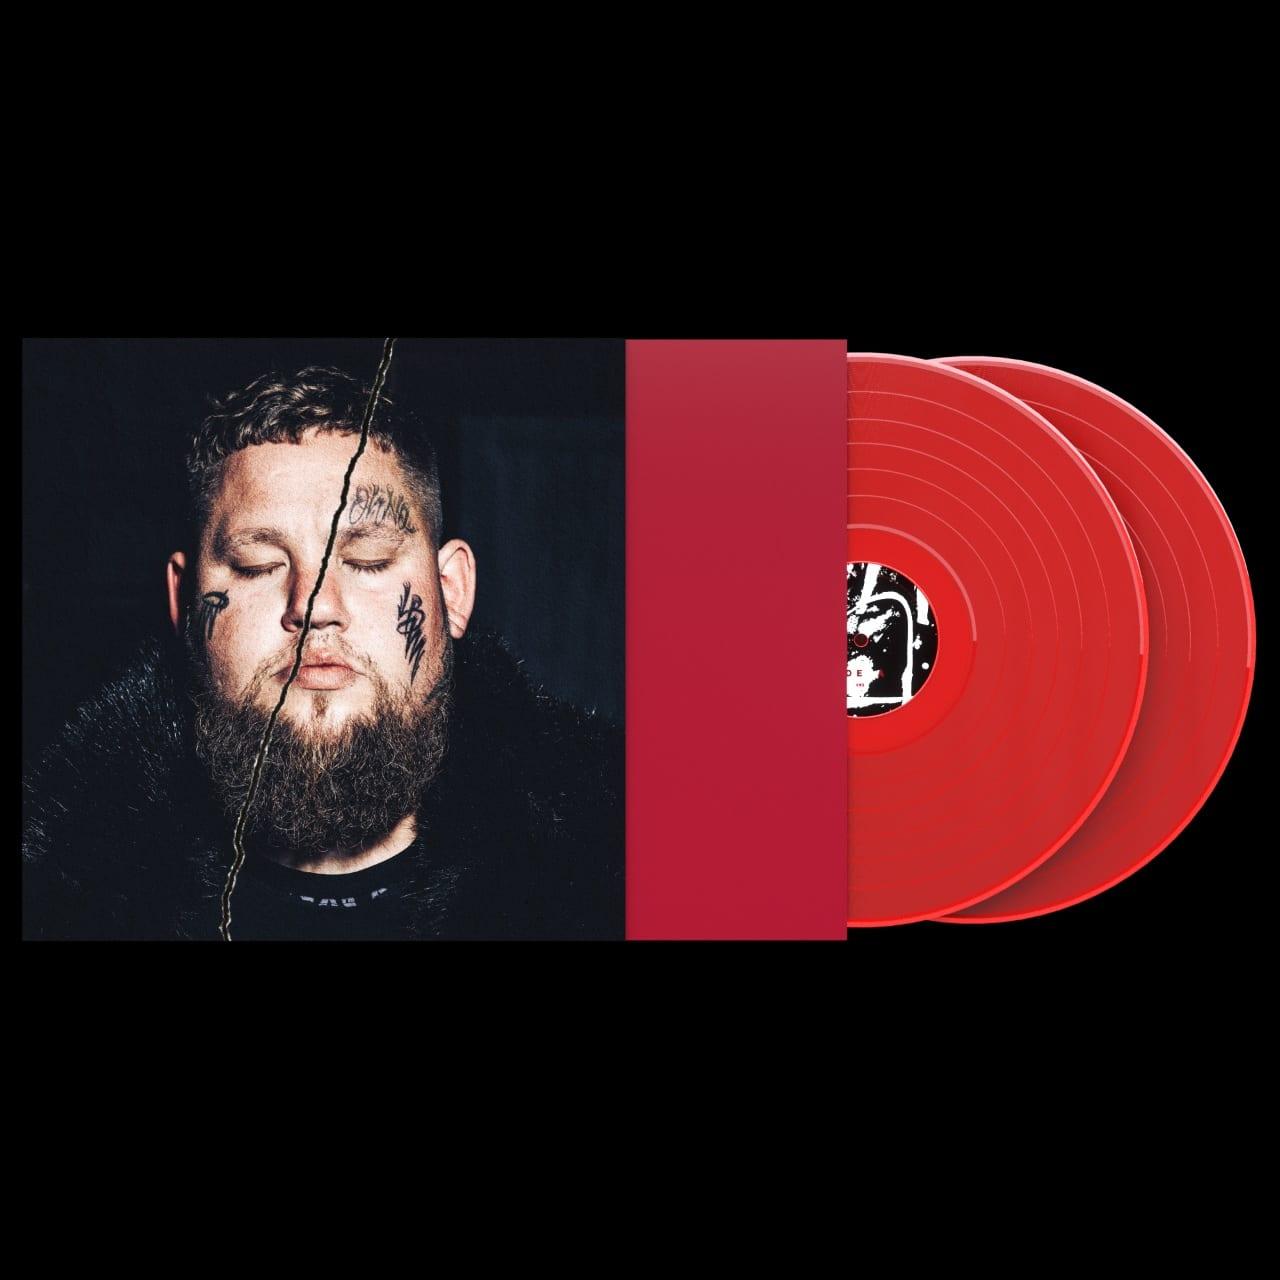 Rag 'N' Bone Man - Life By Misadventure | Black Circle Records